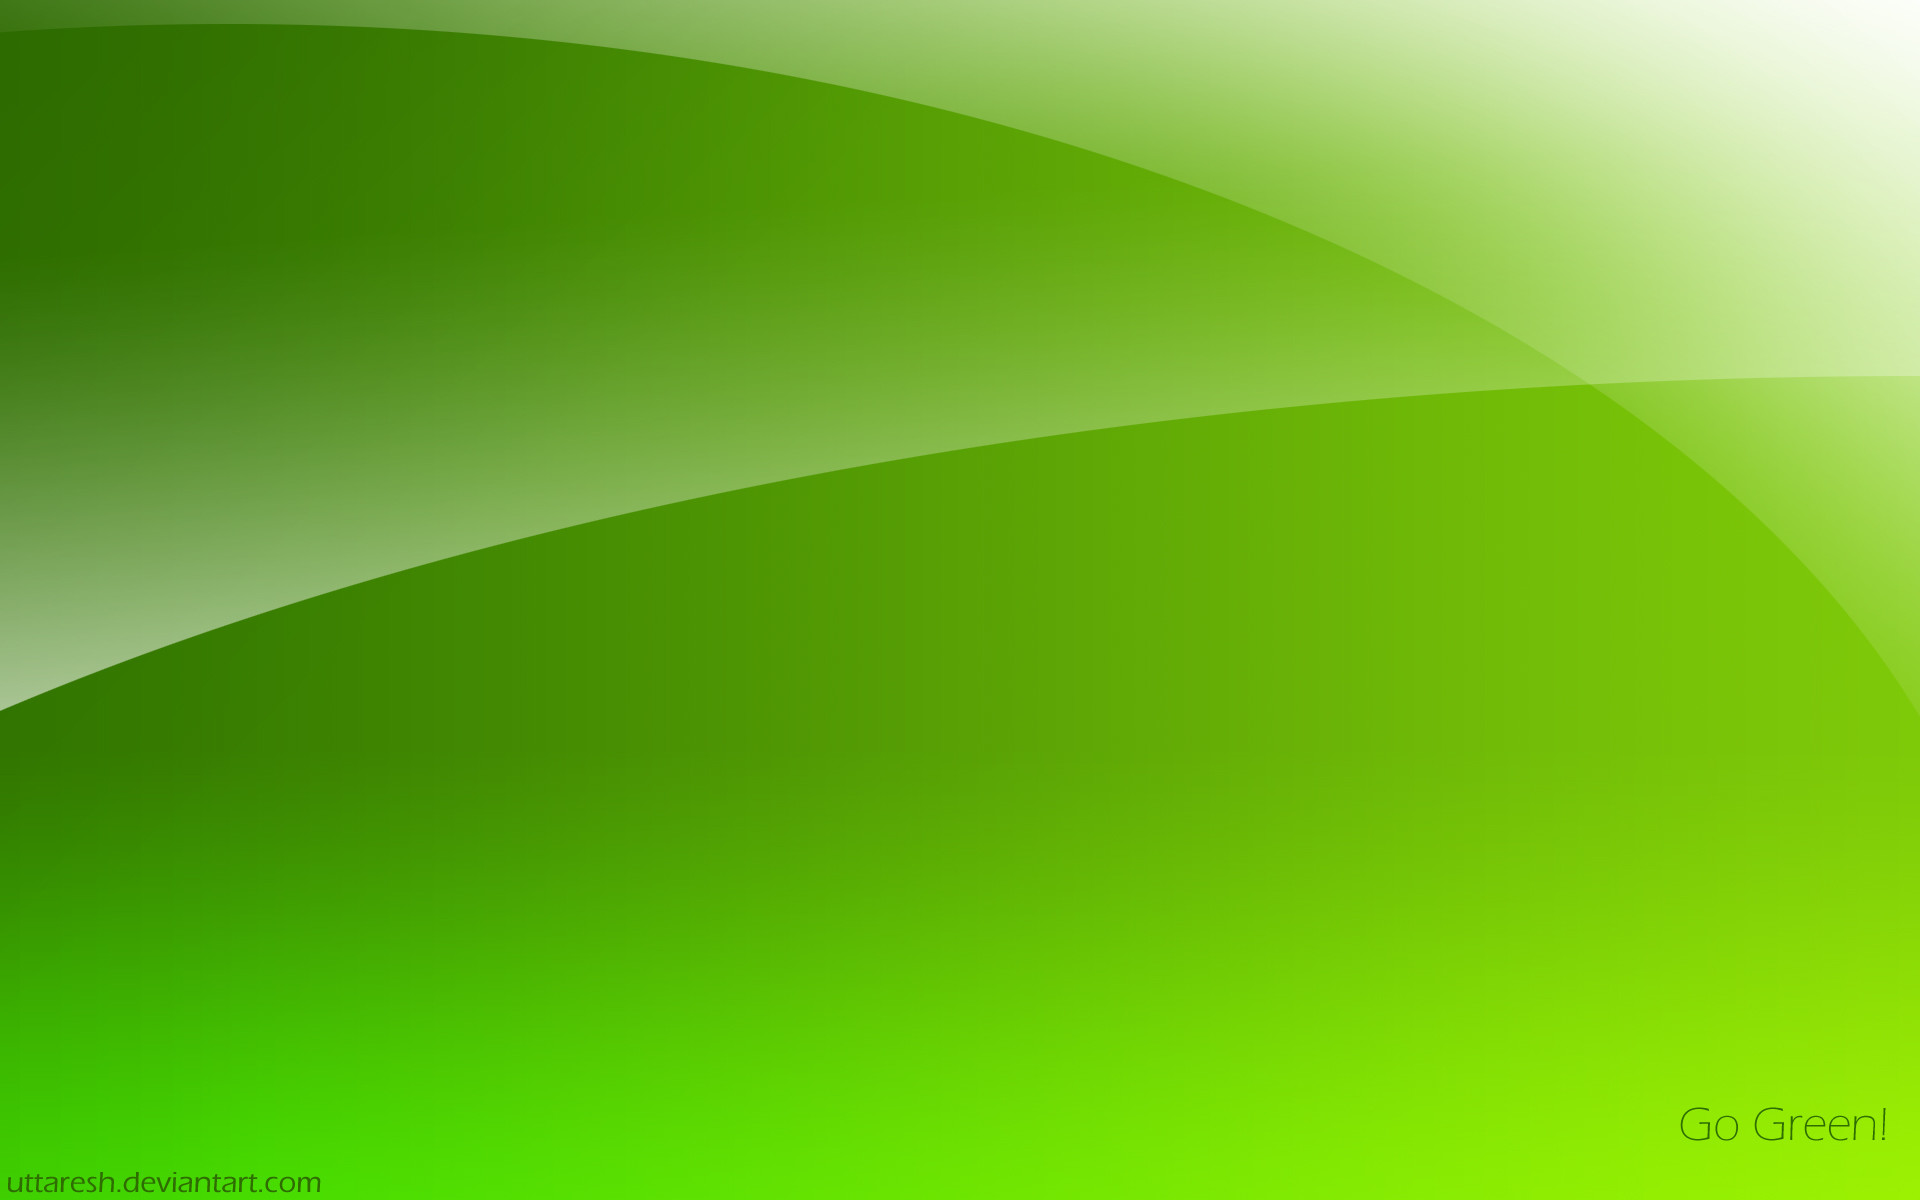 Green Color Background Wallpaper 56 Images